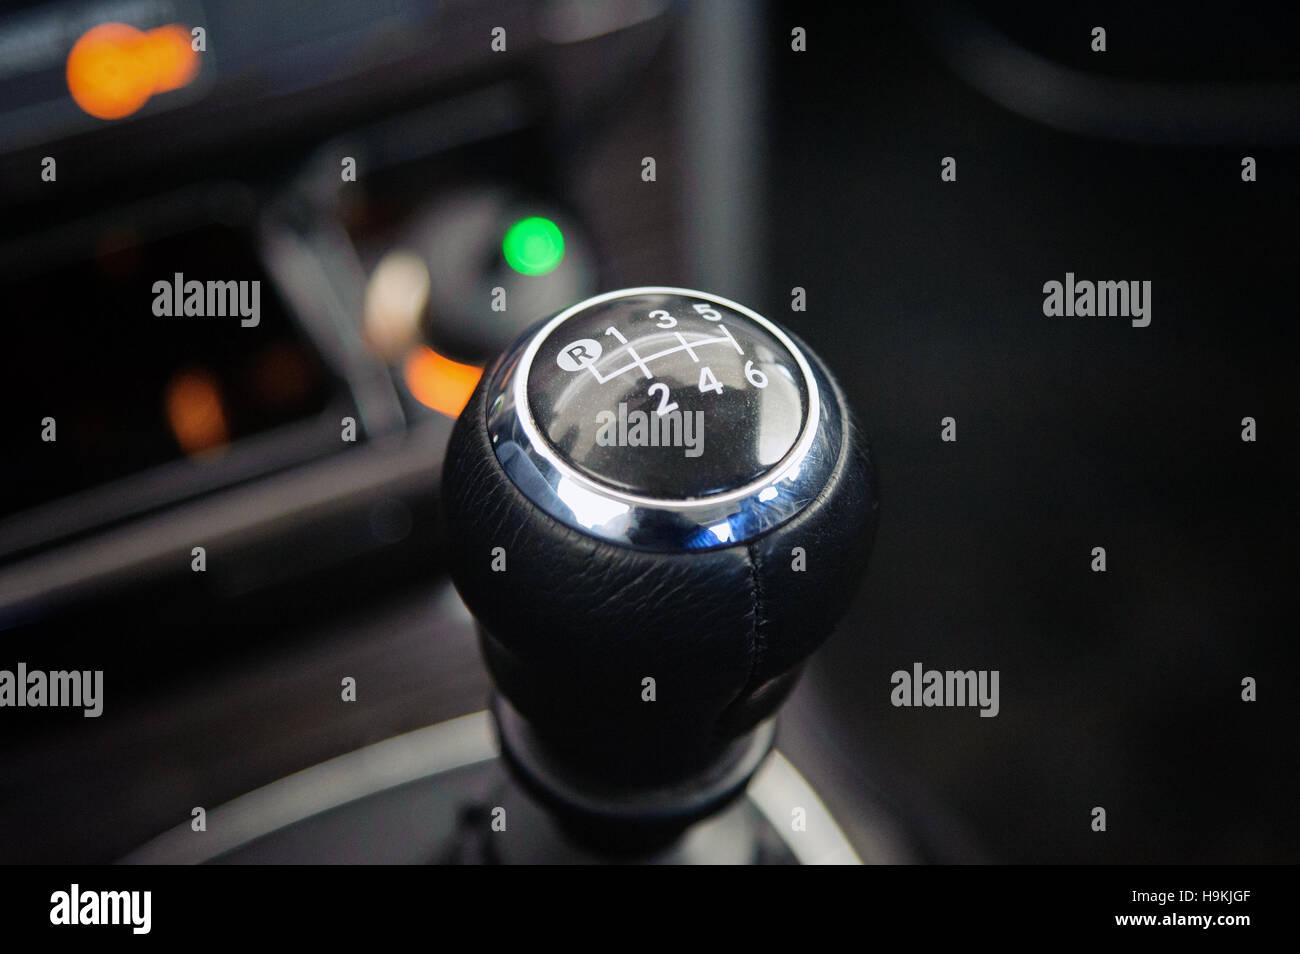 Gear Stick Stock Photos & Gear Stick Stock Images - Alamy